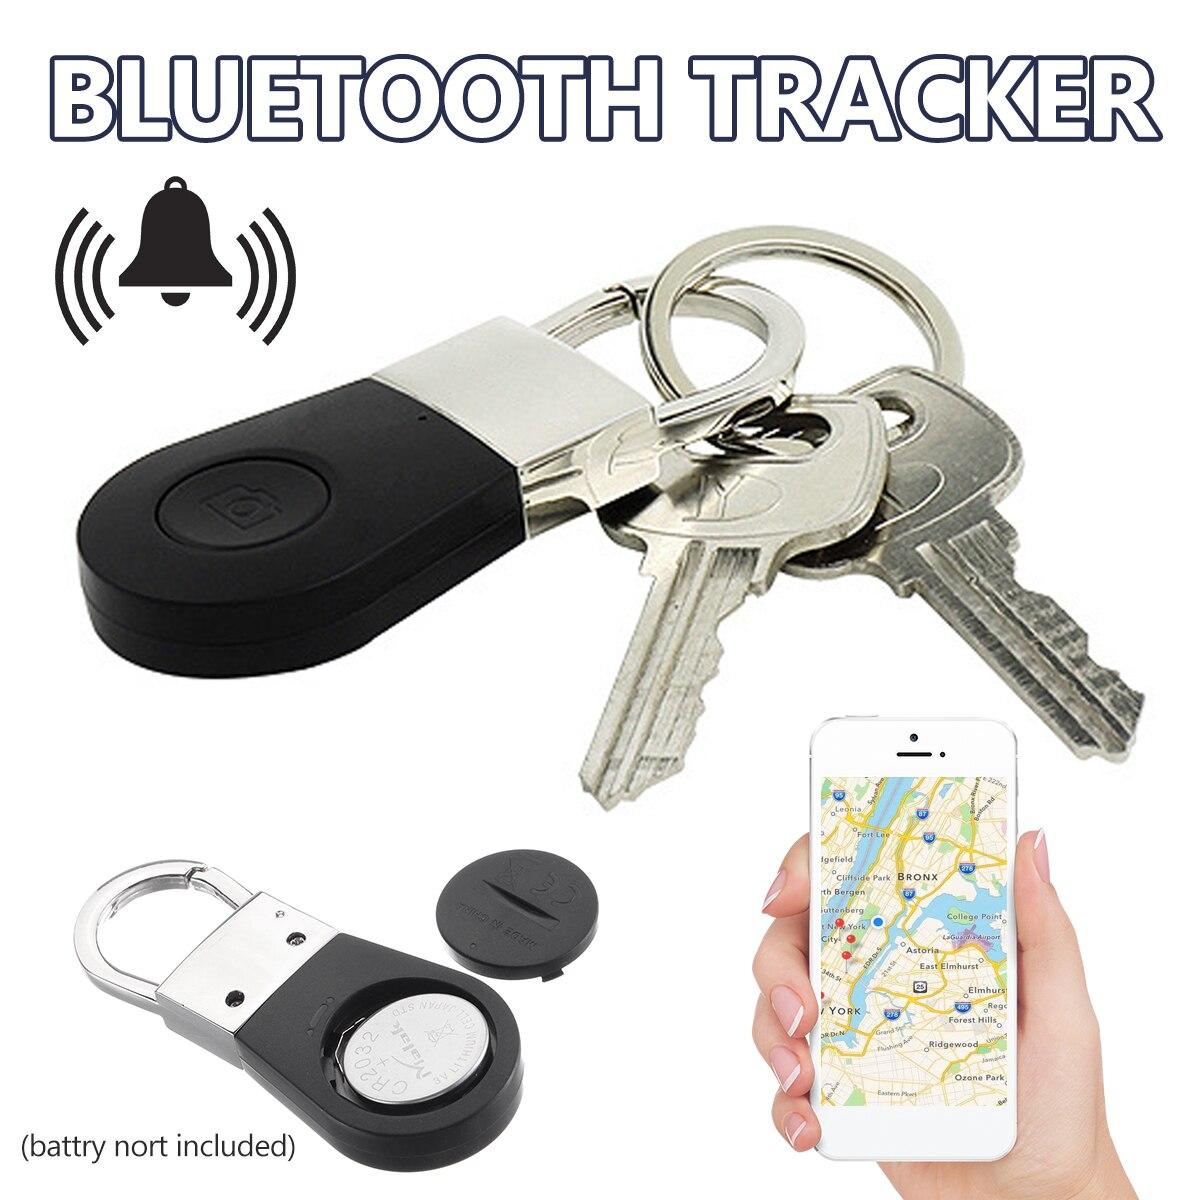 Wireless Bluetooth Keychain Tracker Locator Anti Lost Smart Key Locator Alarm Child Pet GPS Tracking Finder Device for Phone honest bluetooth anti lost tracking electronic key tracker